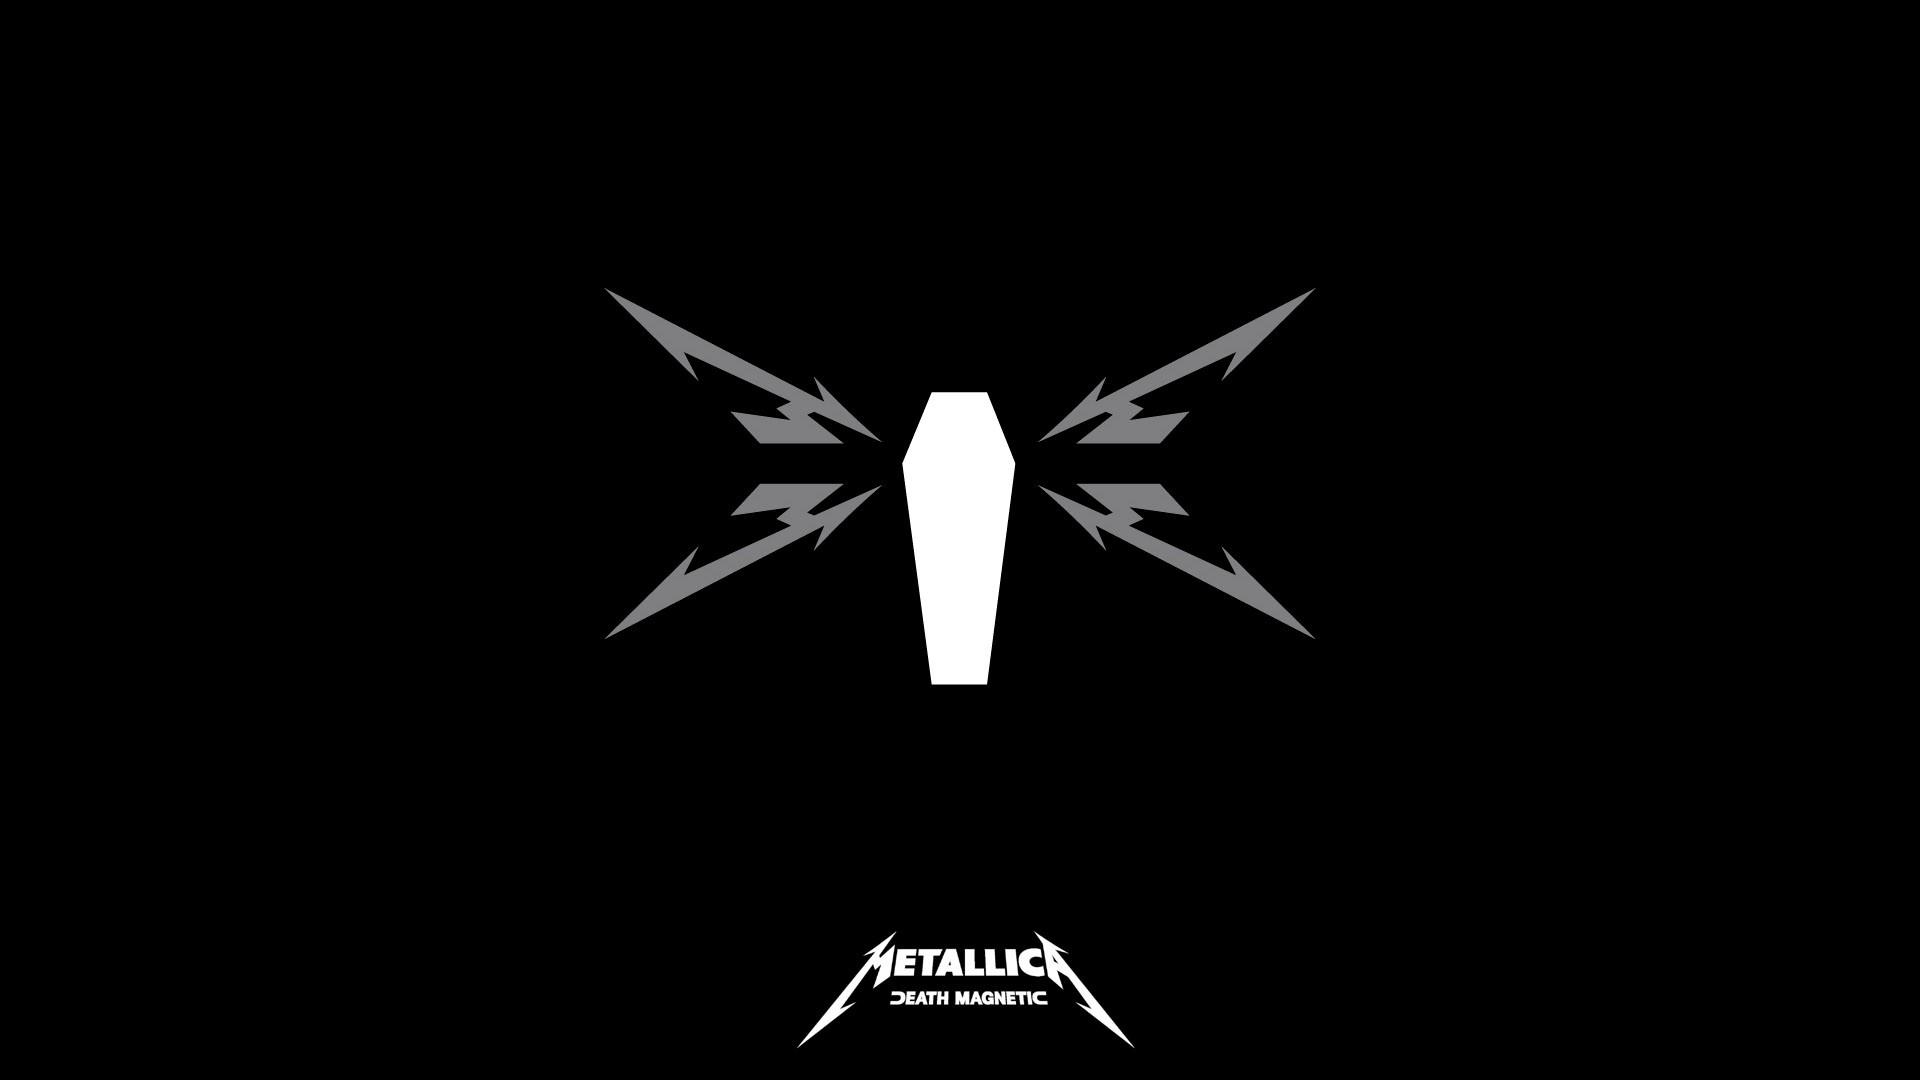 General 1920x1080 Metallica  Big 4  band logo heavy metal thrash metal